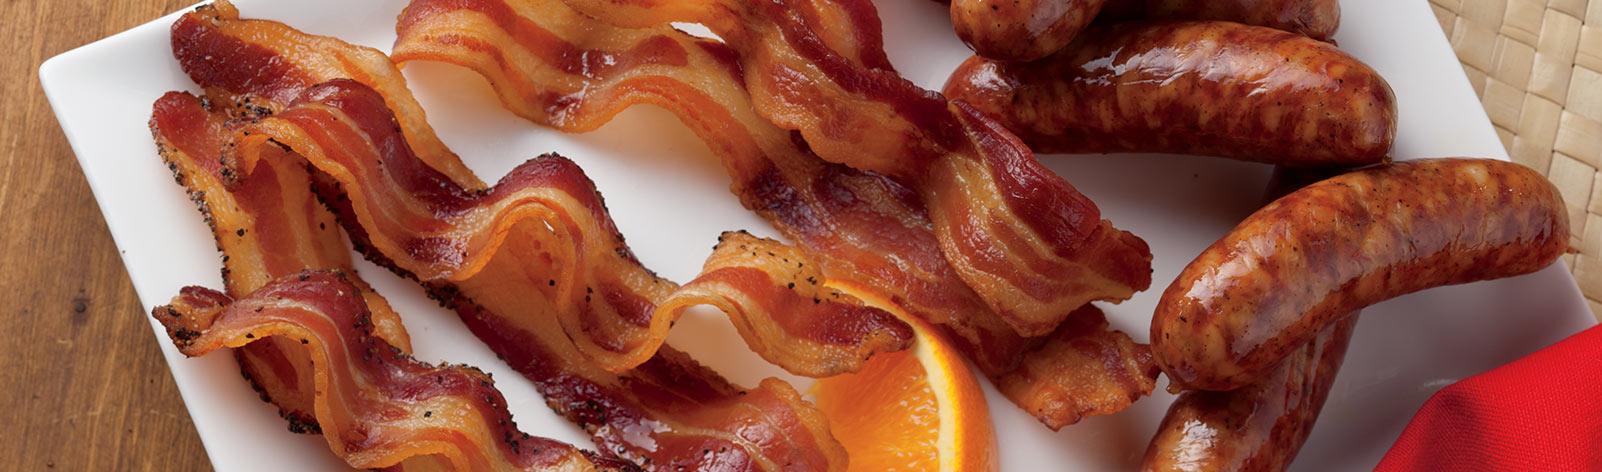 Best-Selling Smoked Meats Desktop Slider